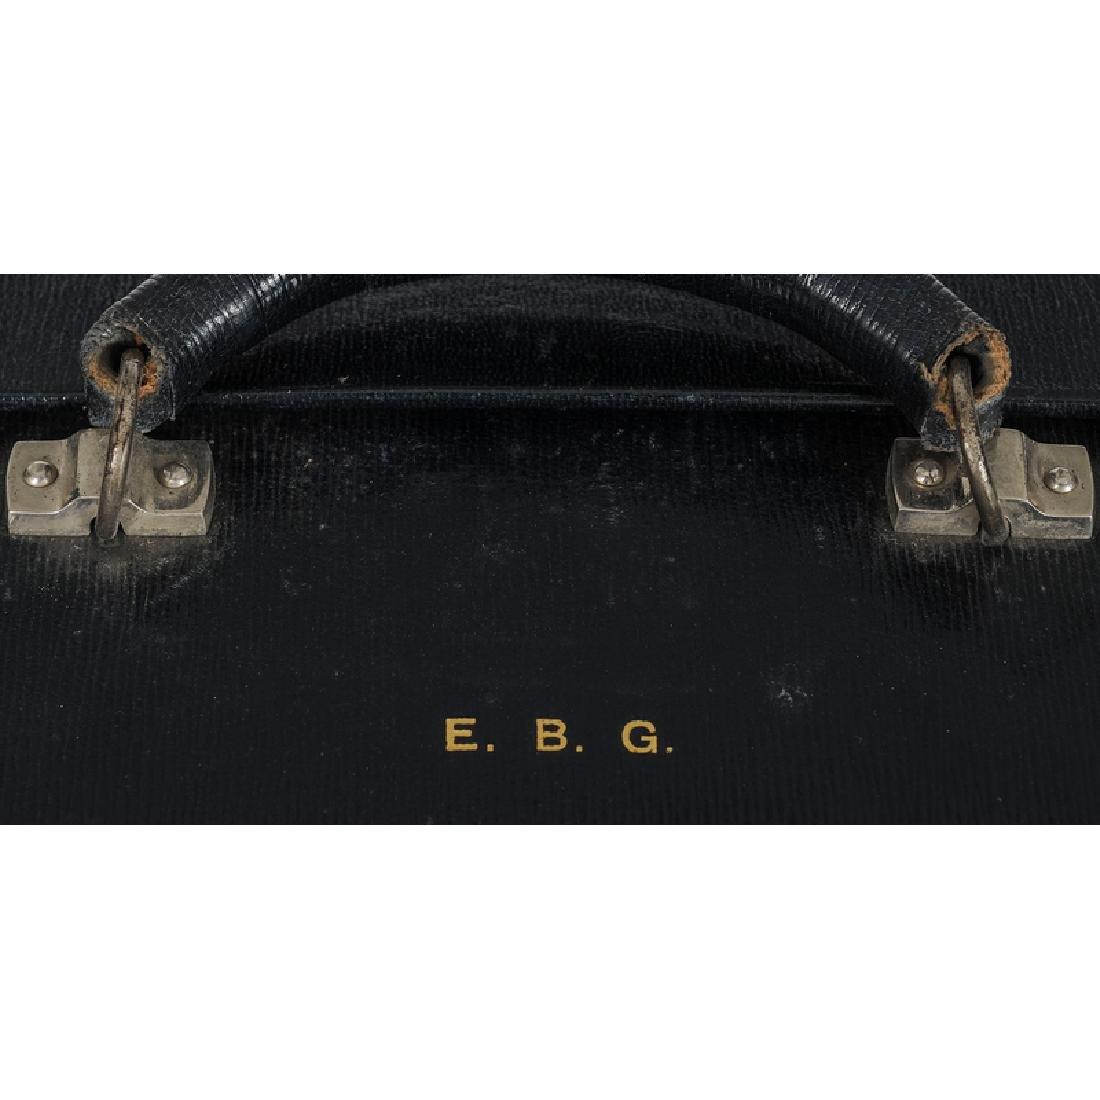 R. Blackington & Co. Gentleman's Traveling Toiletry - 5